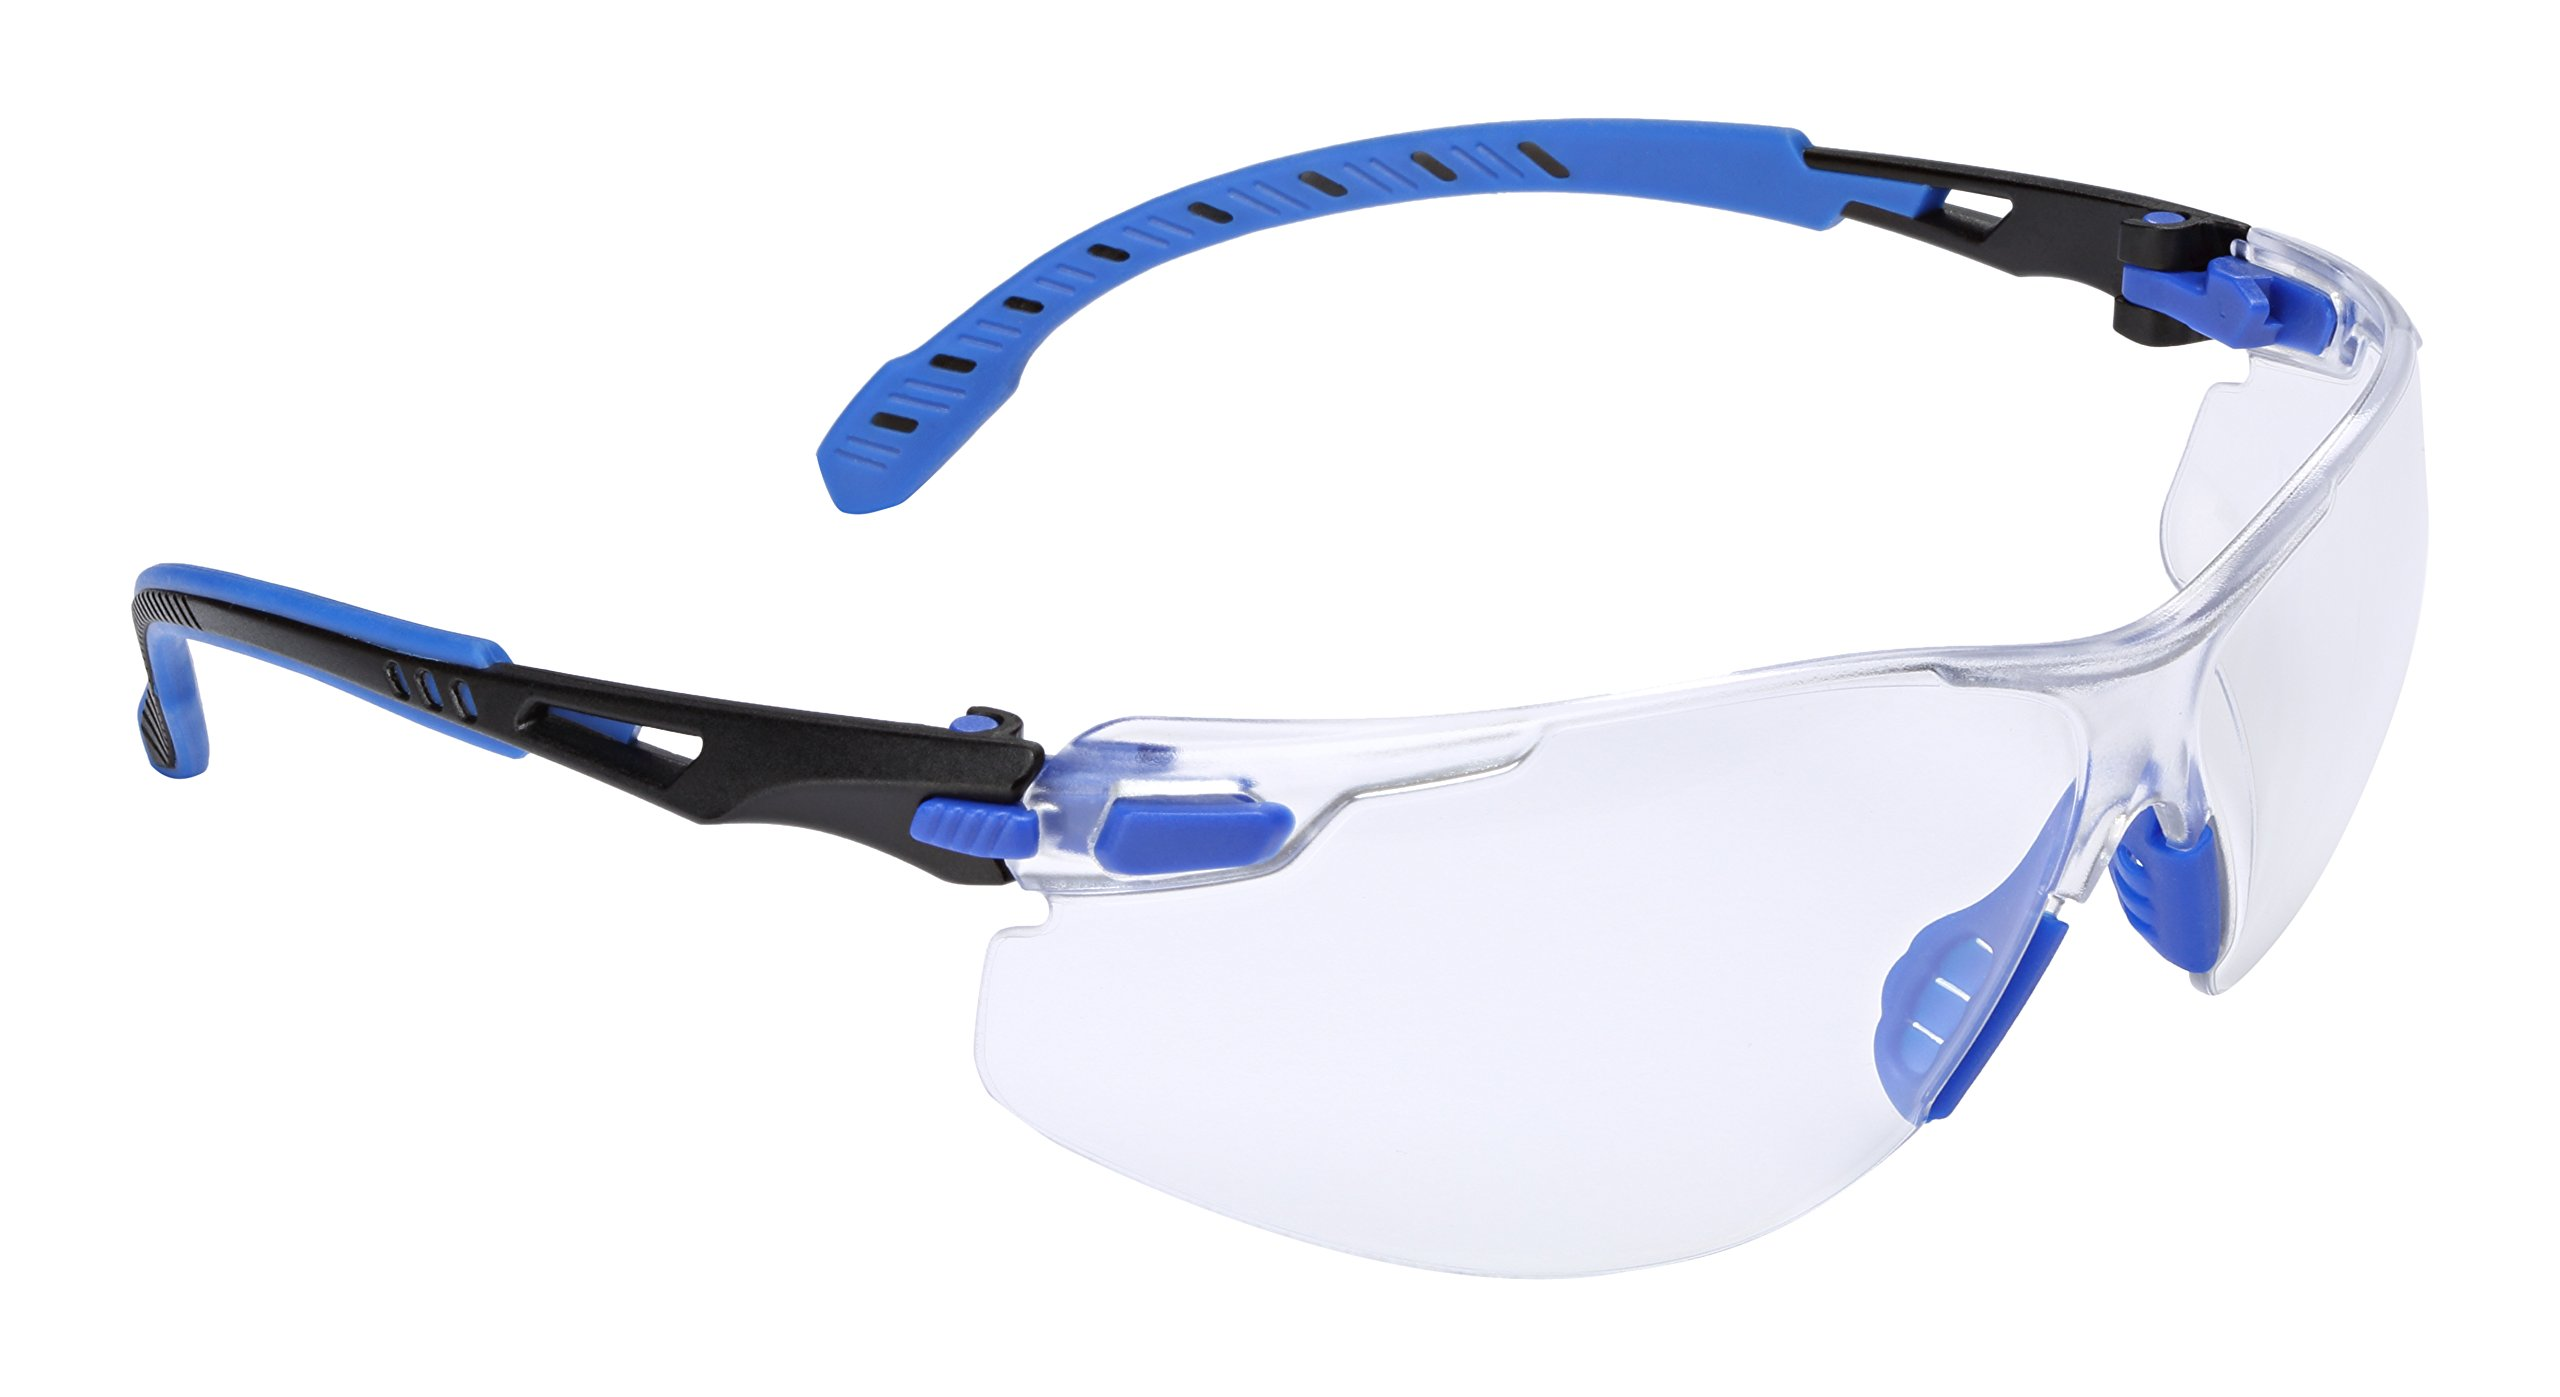 3M Safety Glasses, Solus 1000 Series, ANSI Z87, Scotchgard Anti-Fog Clear Lens, Low Profile Blue/Black Frame